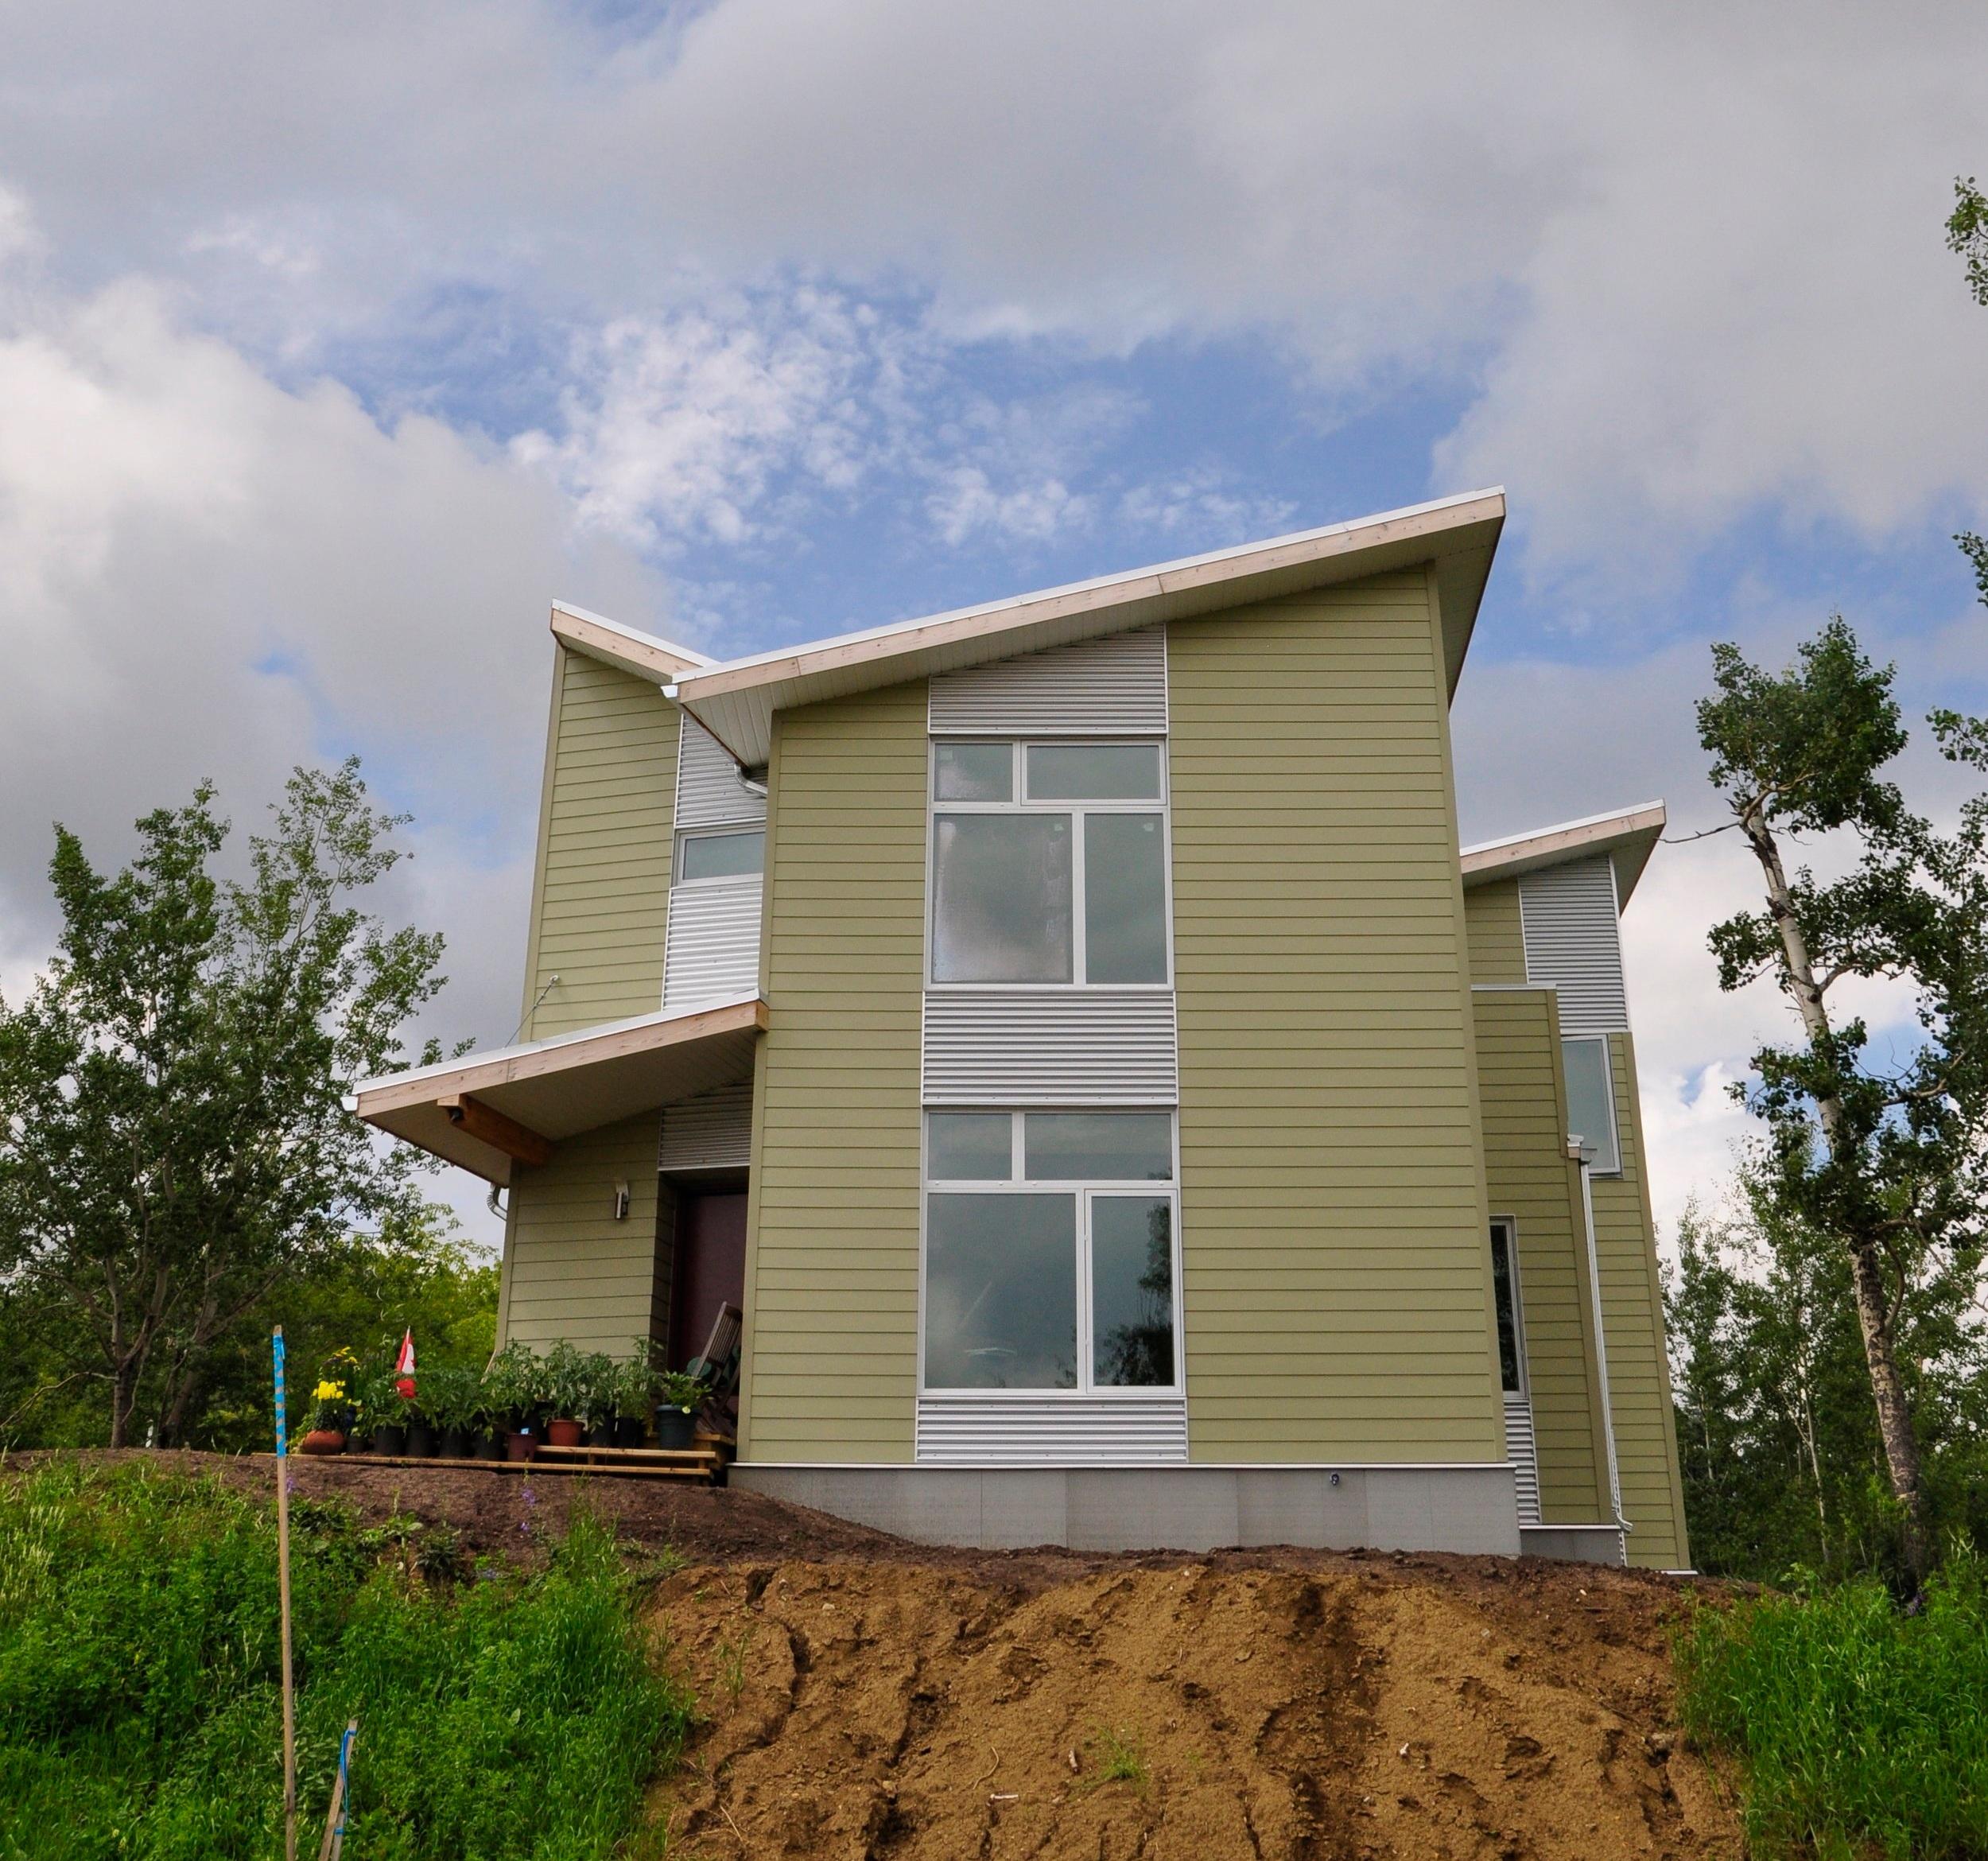 Athabasca Netzero-ready Home